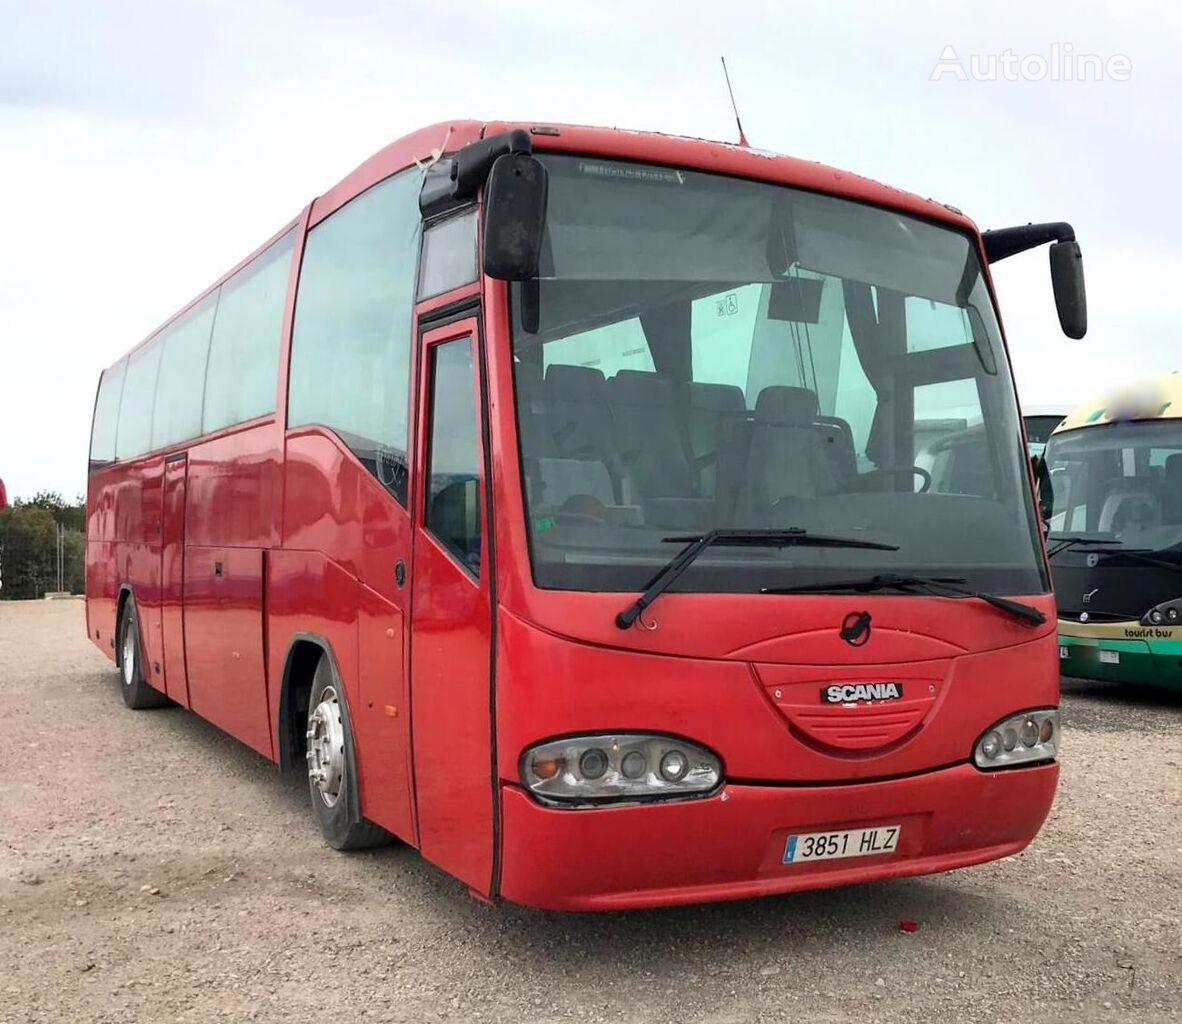 SCANIA  K124 - IRIZAR CENTURY II turistički autobus